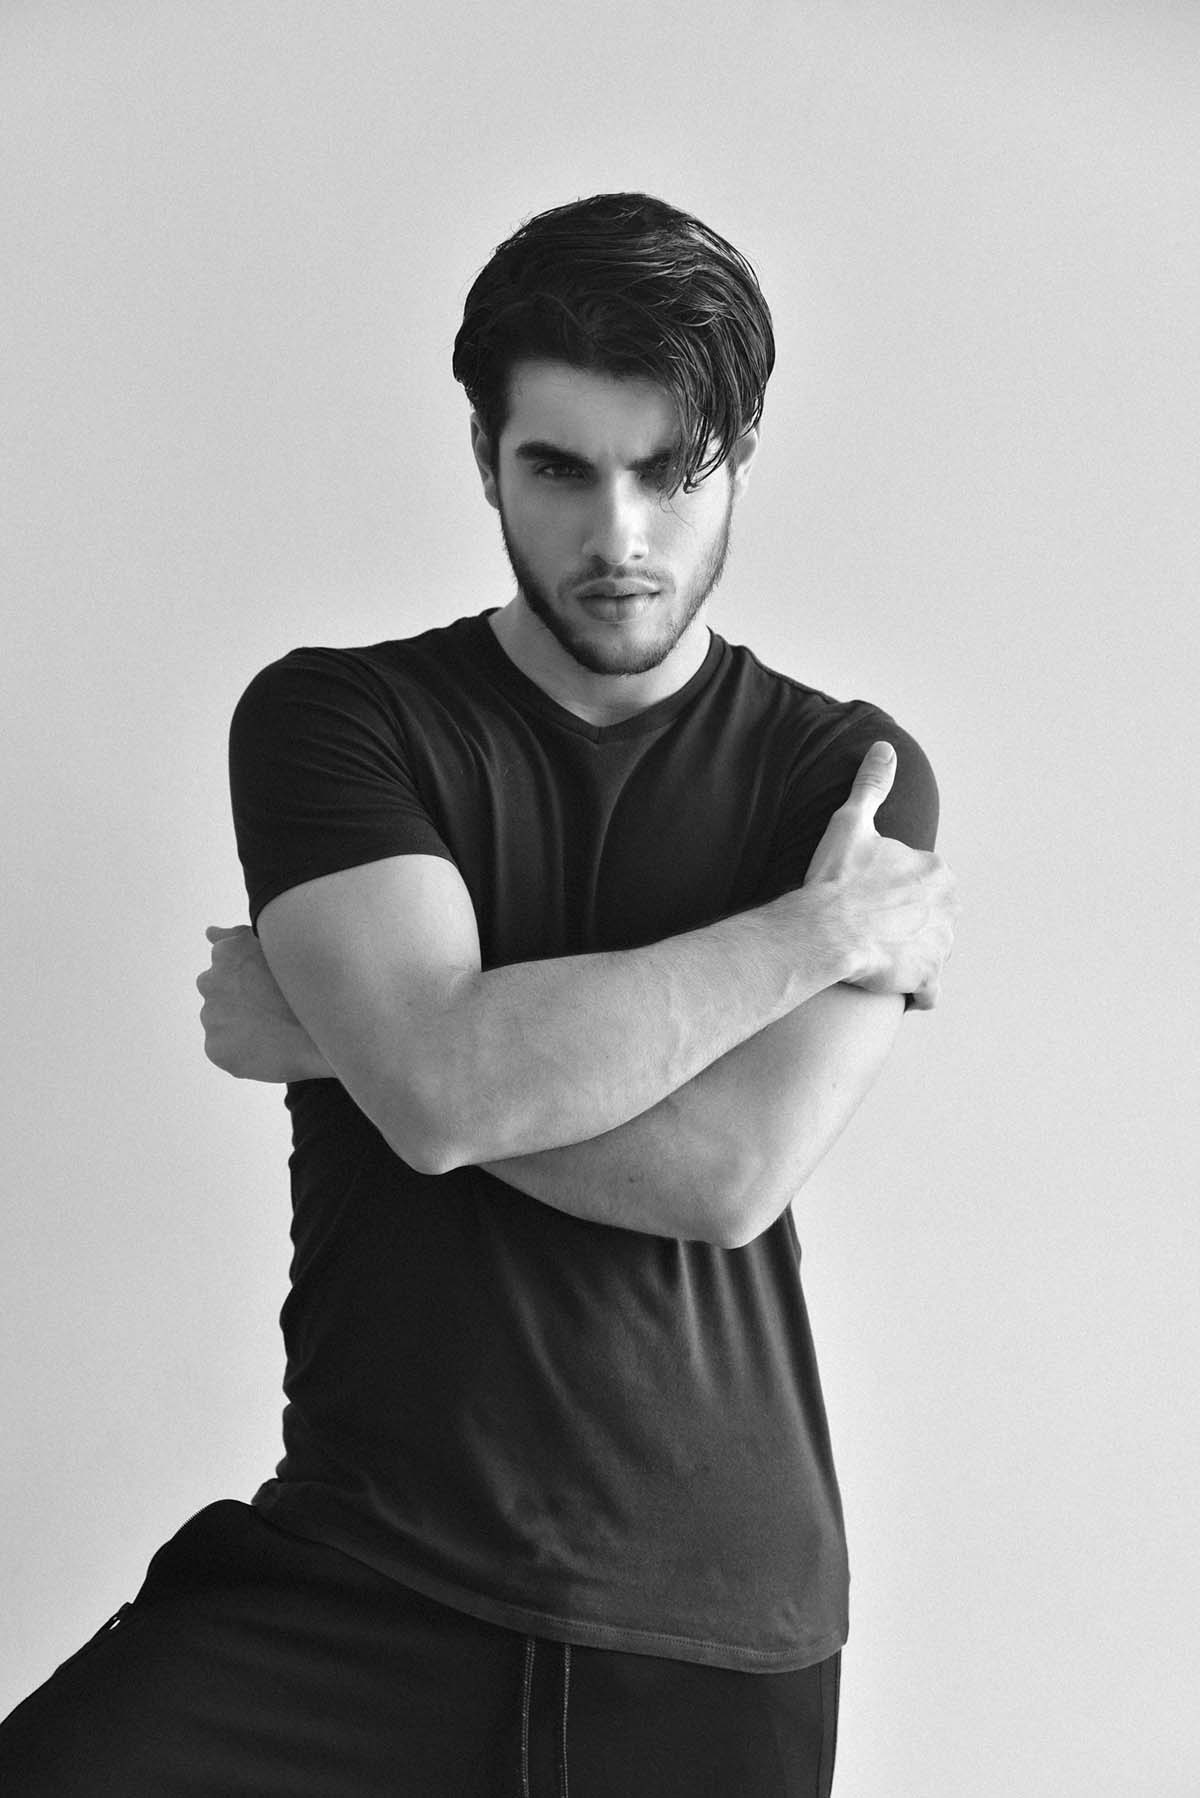 Cesar Lobo by Vitor Lisboa for Brazilian Male Model